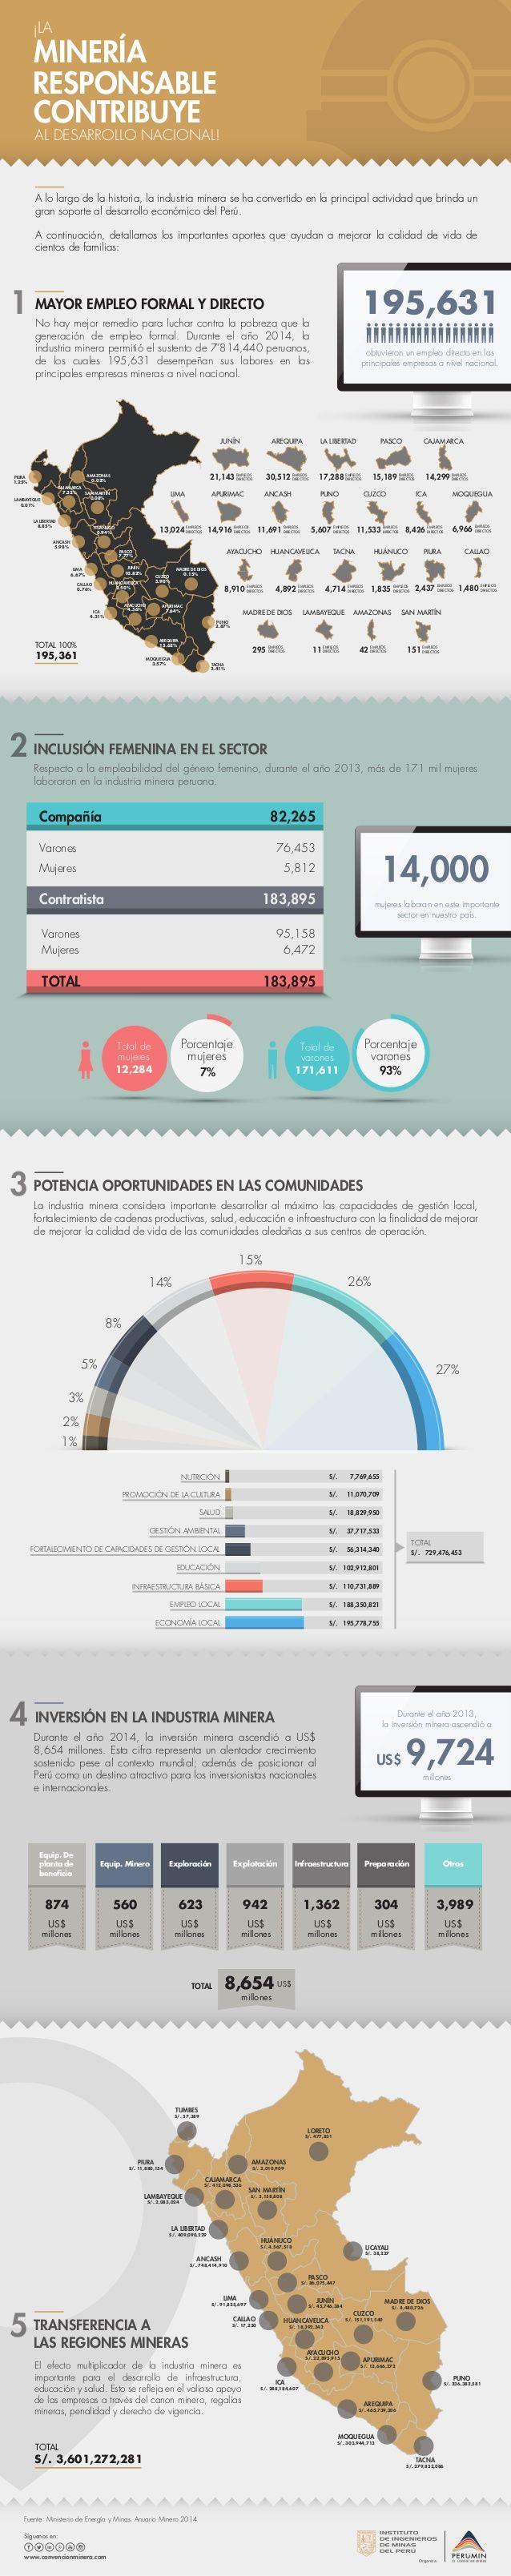 Infographic: La industria minera contribuye al desarrollo del Perú